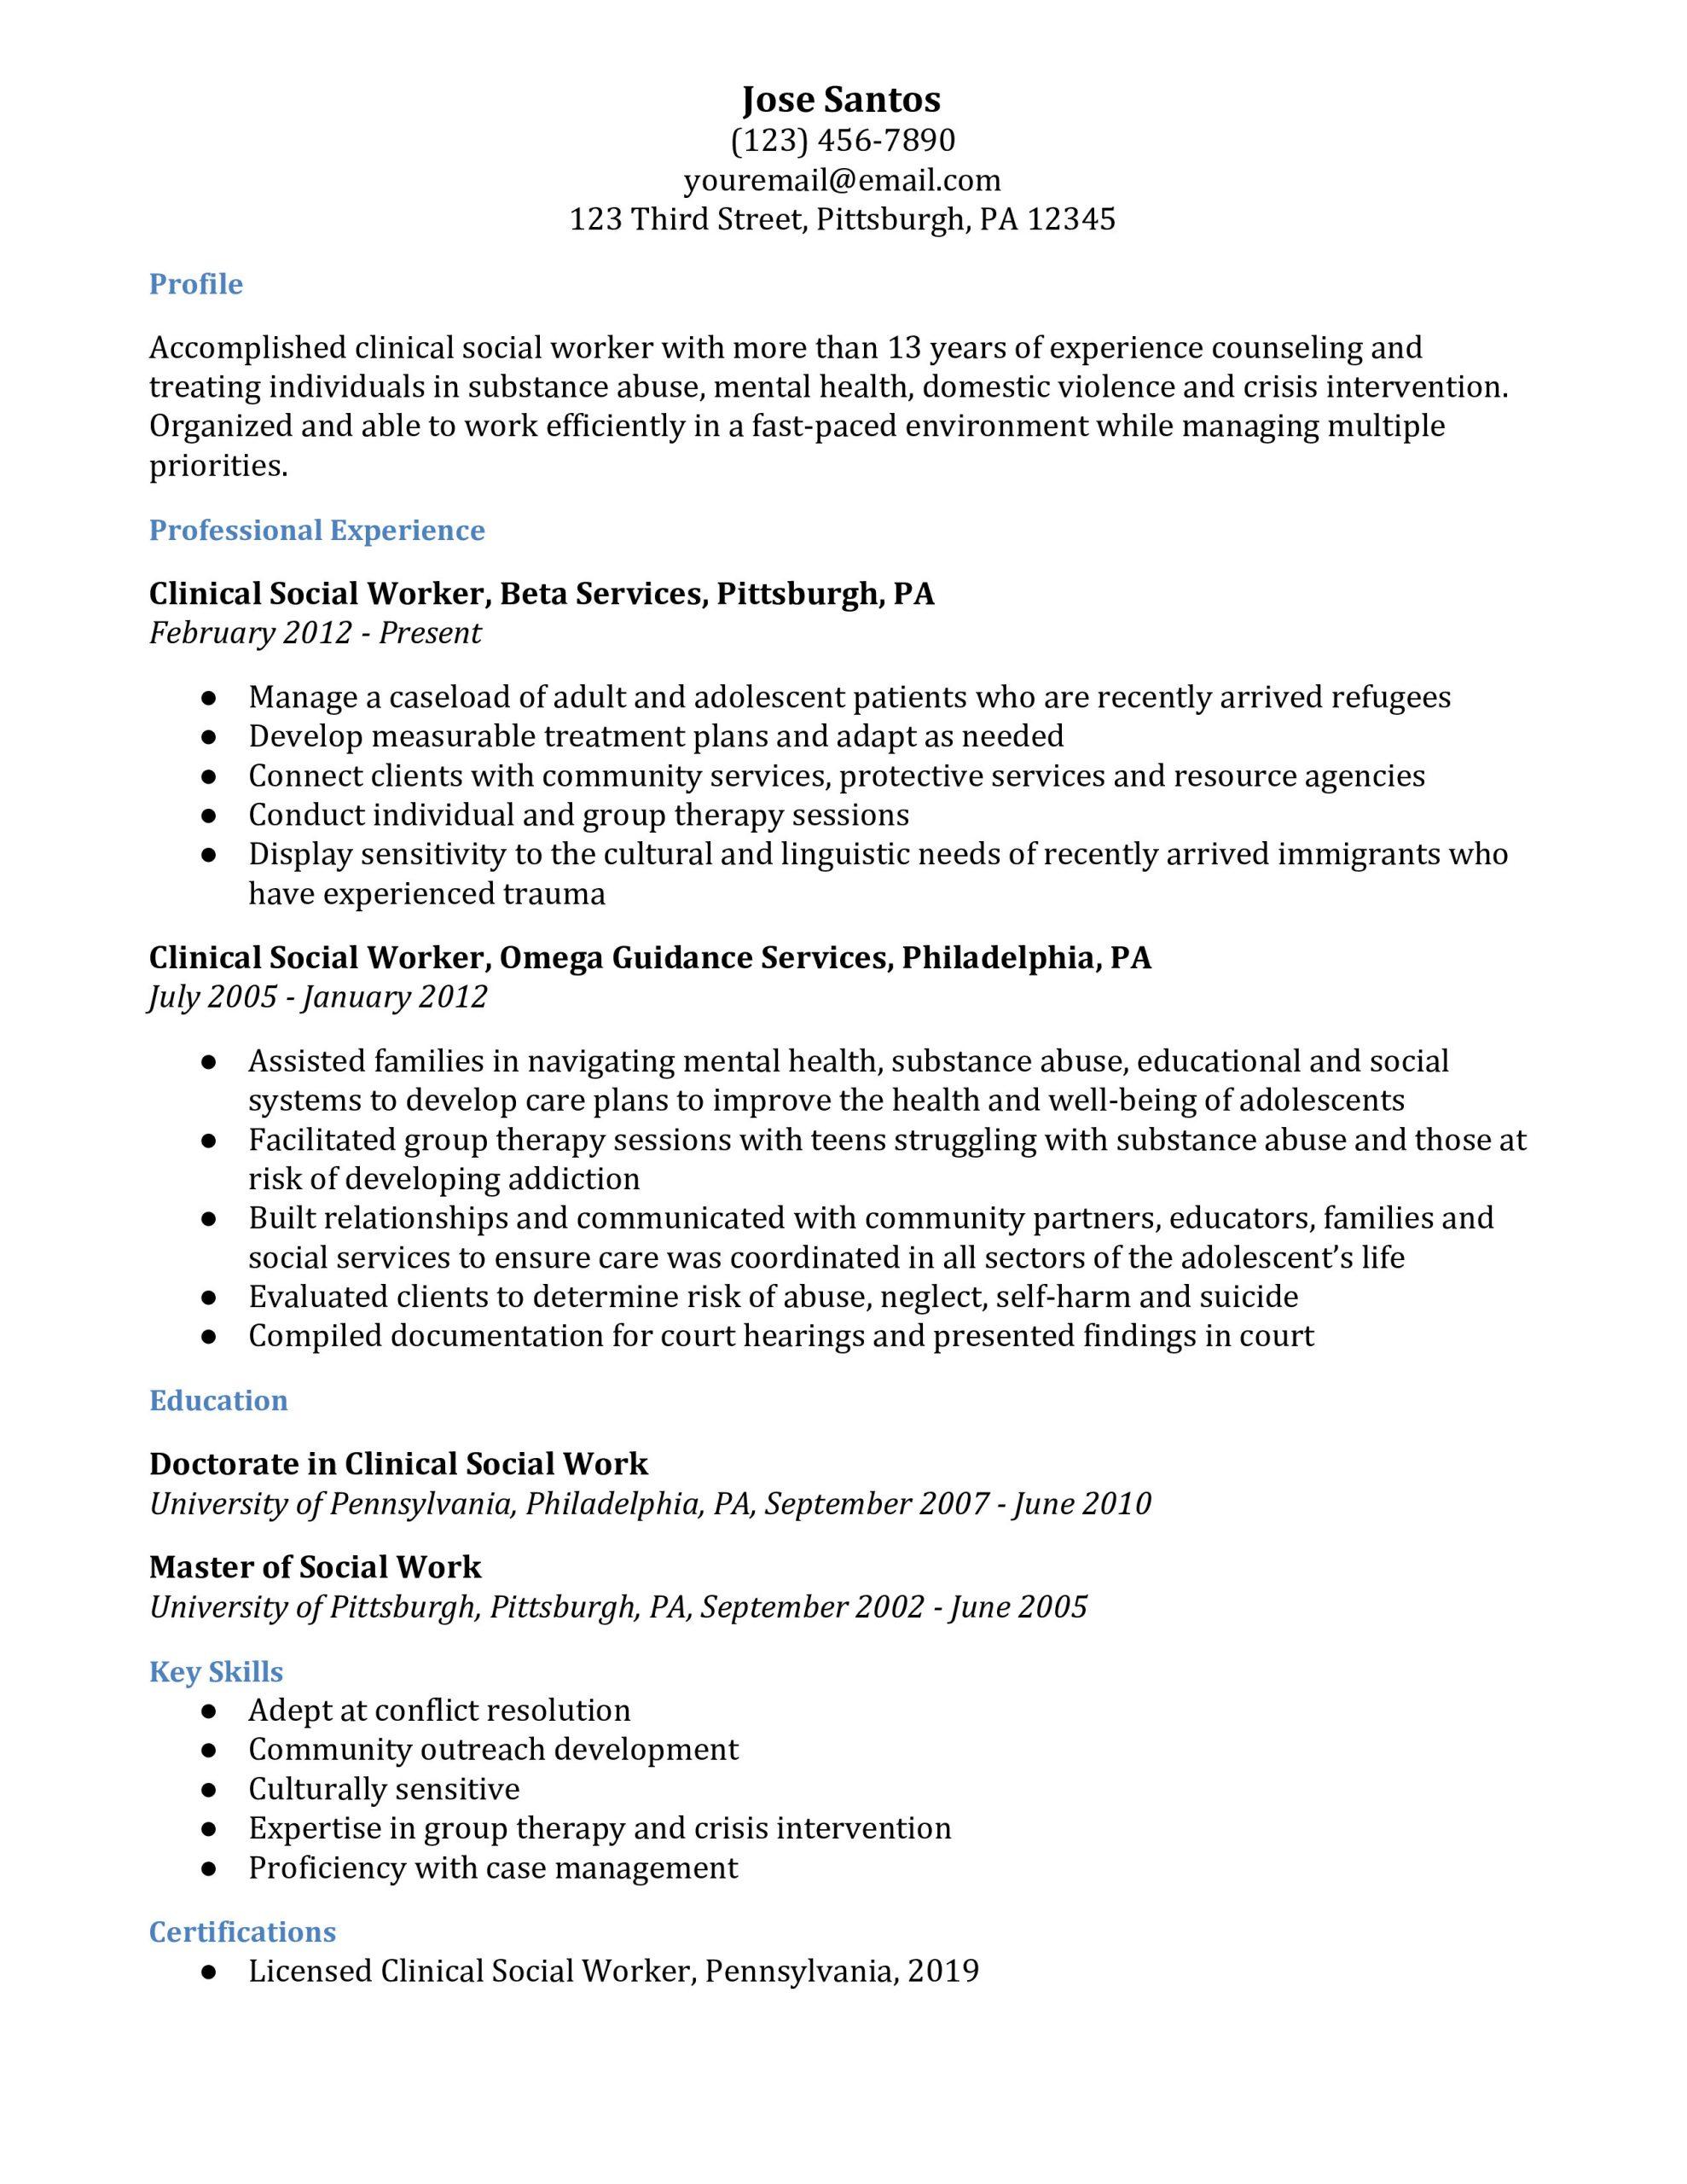 social work resume examples